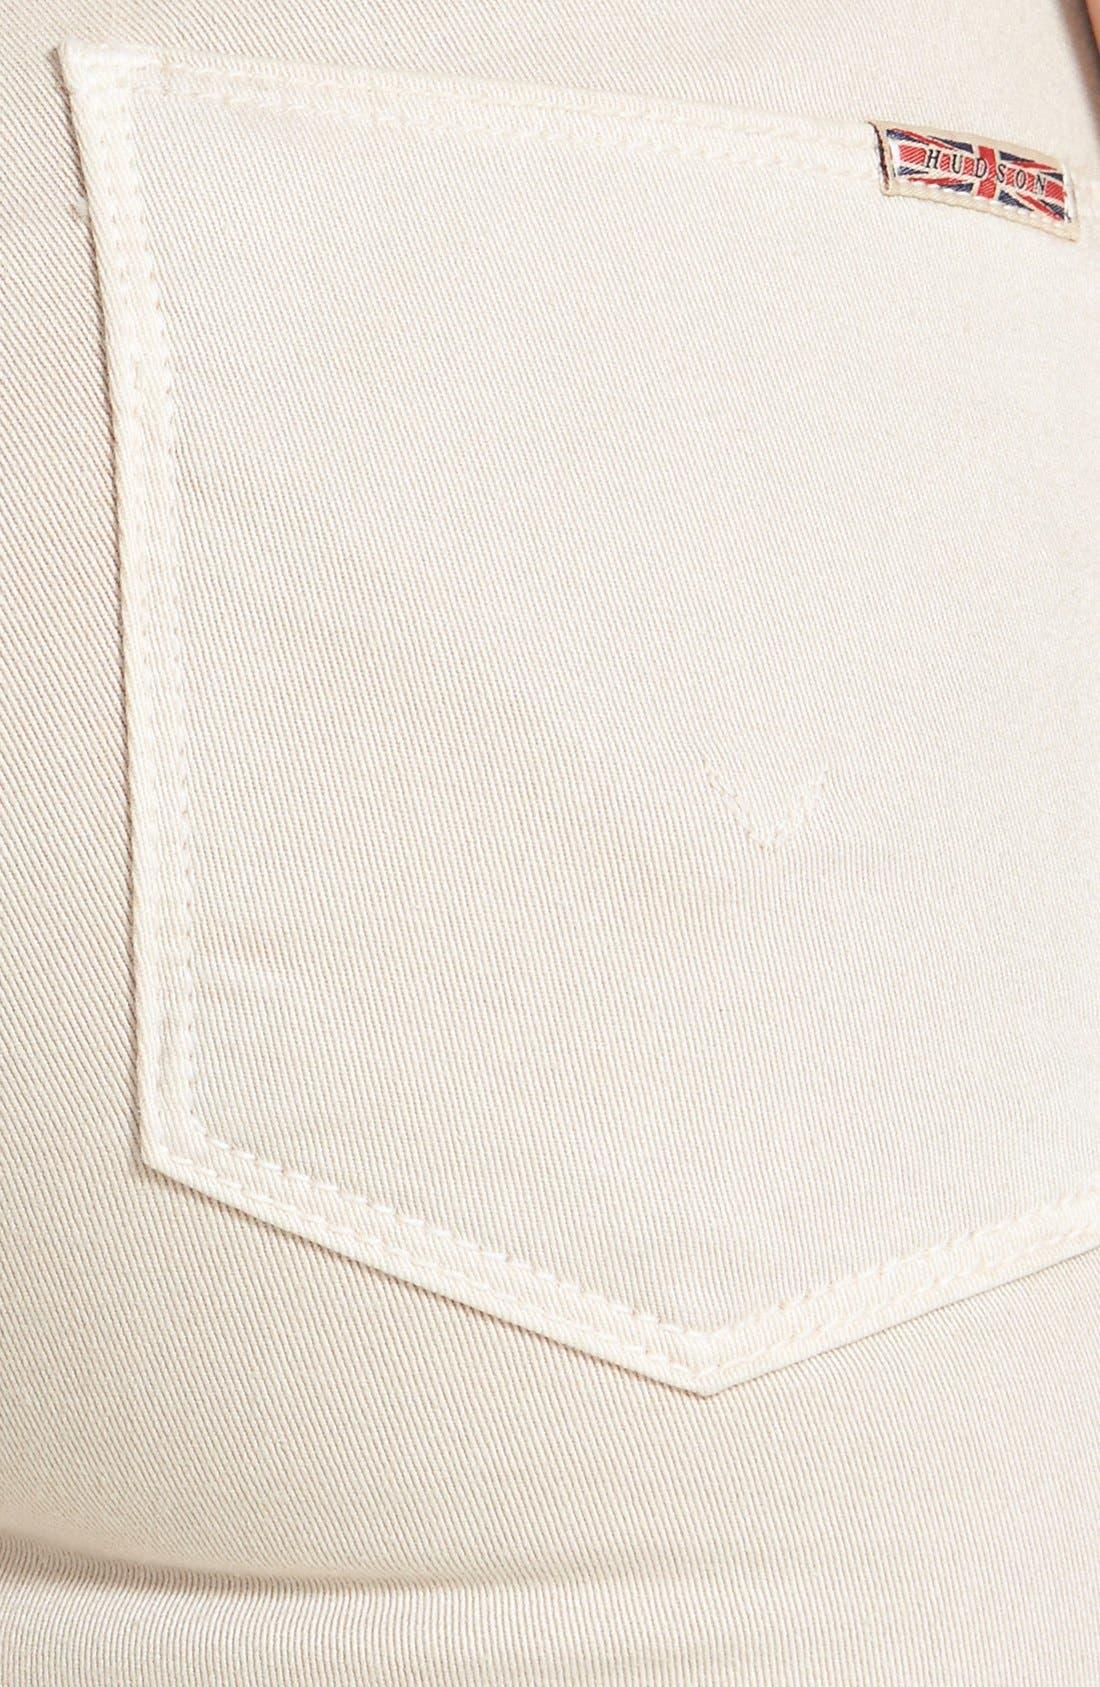 Alternate Image 3  - Hudson Jeans Mid Rise Skinny Jeans (Wood Ash)